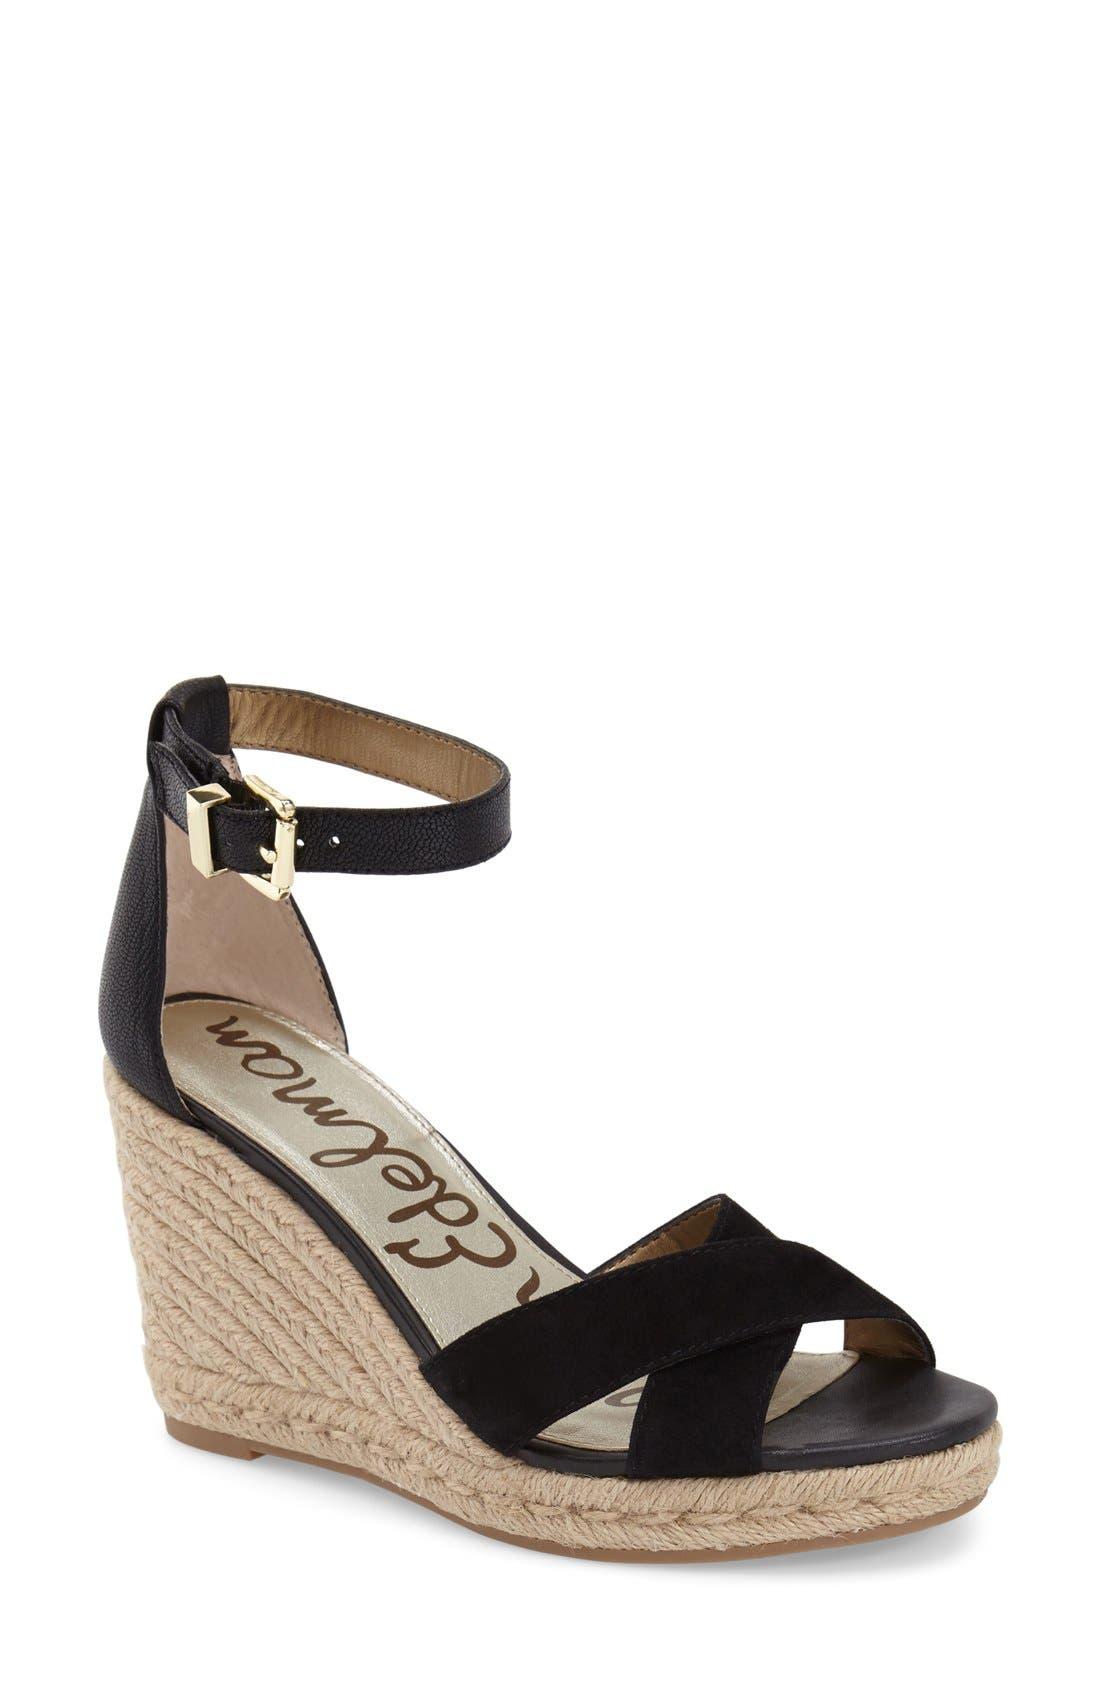 'Brenda' Espadrille Wedge Sandal, Main, color, 001